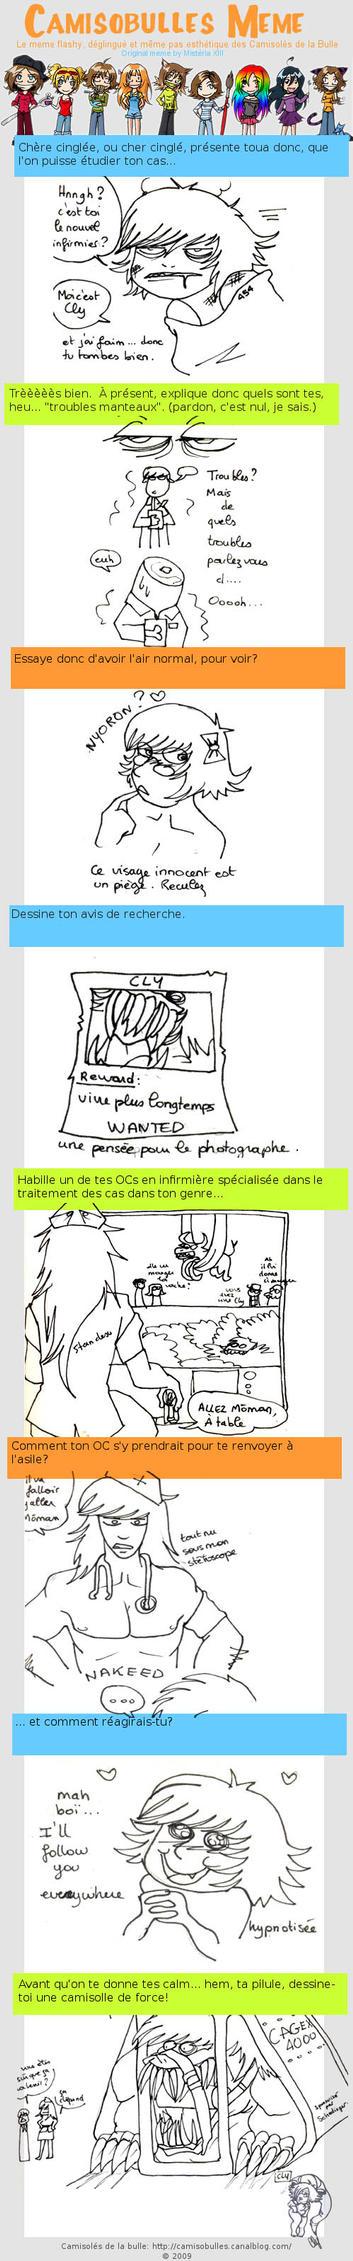 :Meme: Camisobulles by Clytemnon